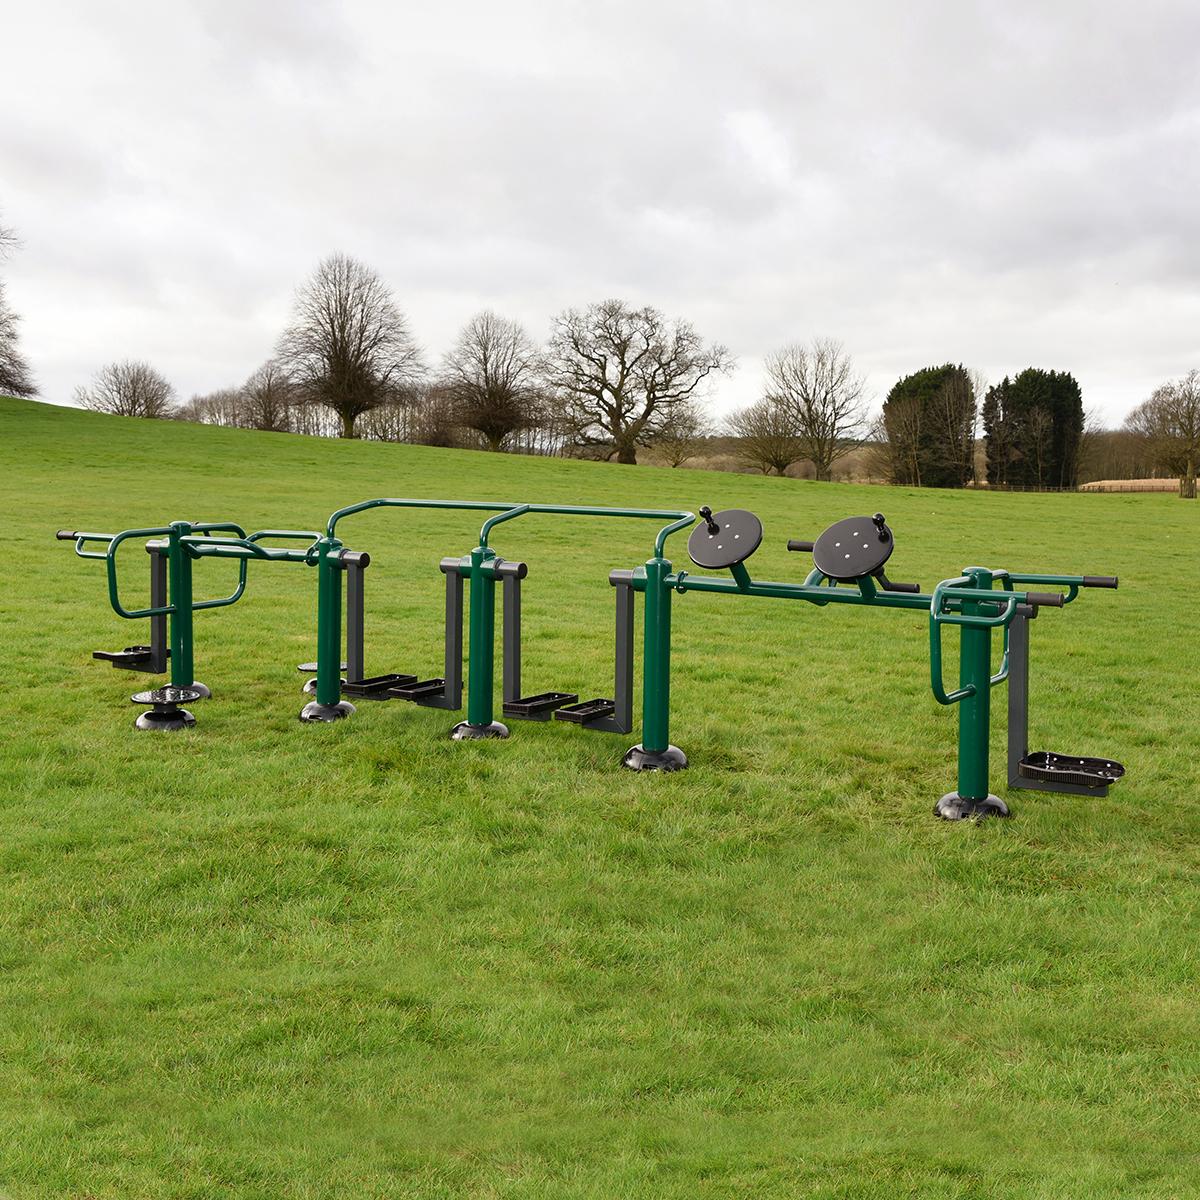 Children's ACTIV8 Multi Gym | Children's outdoor fitness station from Sunshine Gym